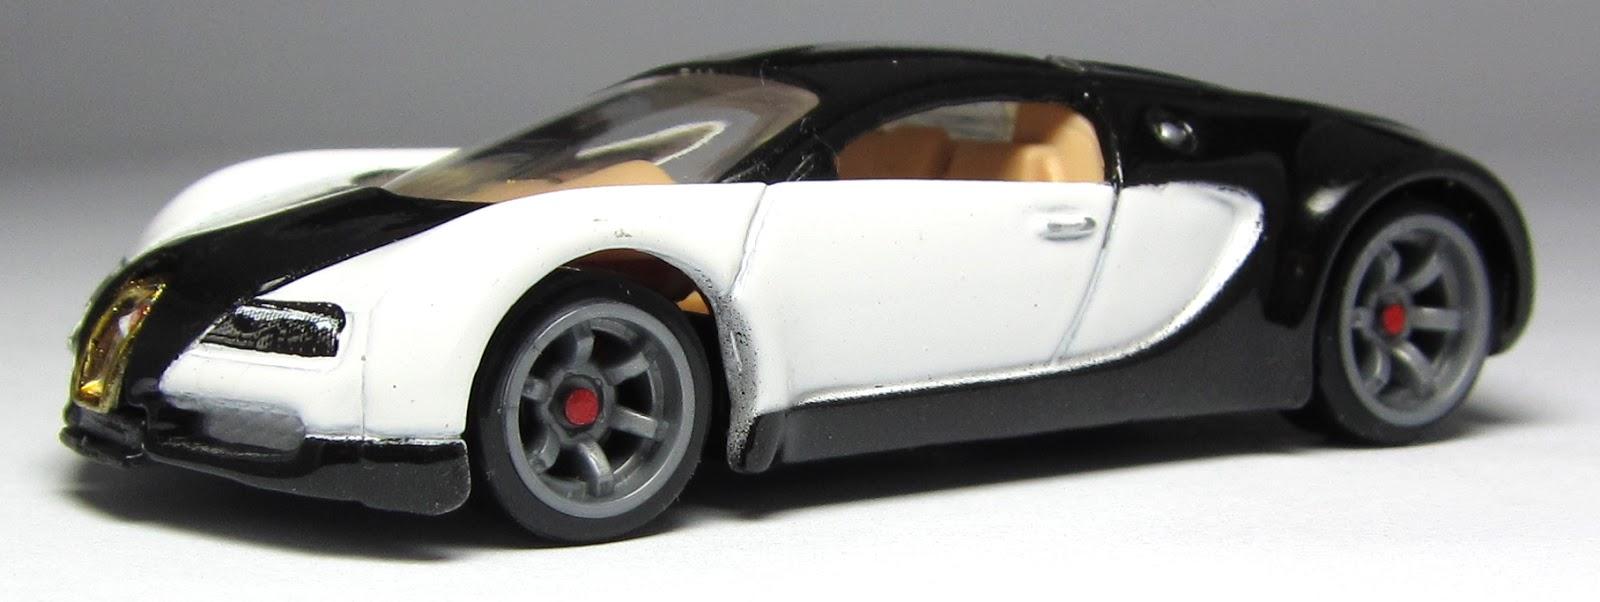 Model of the Day: Hot Wheels Speed Machines Bugatti Veyron ...